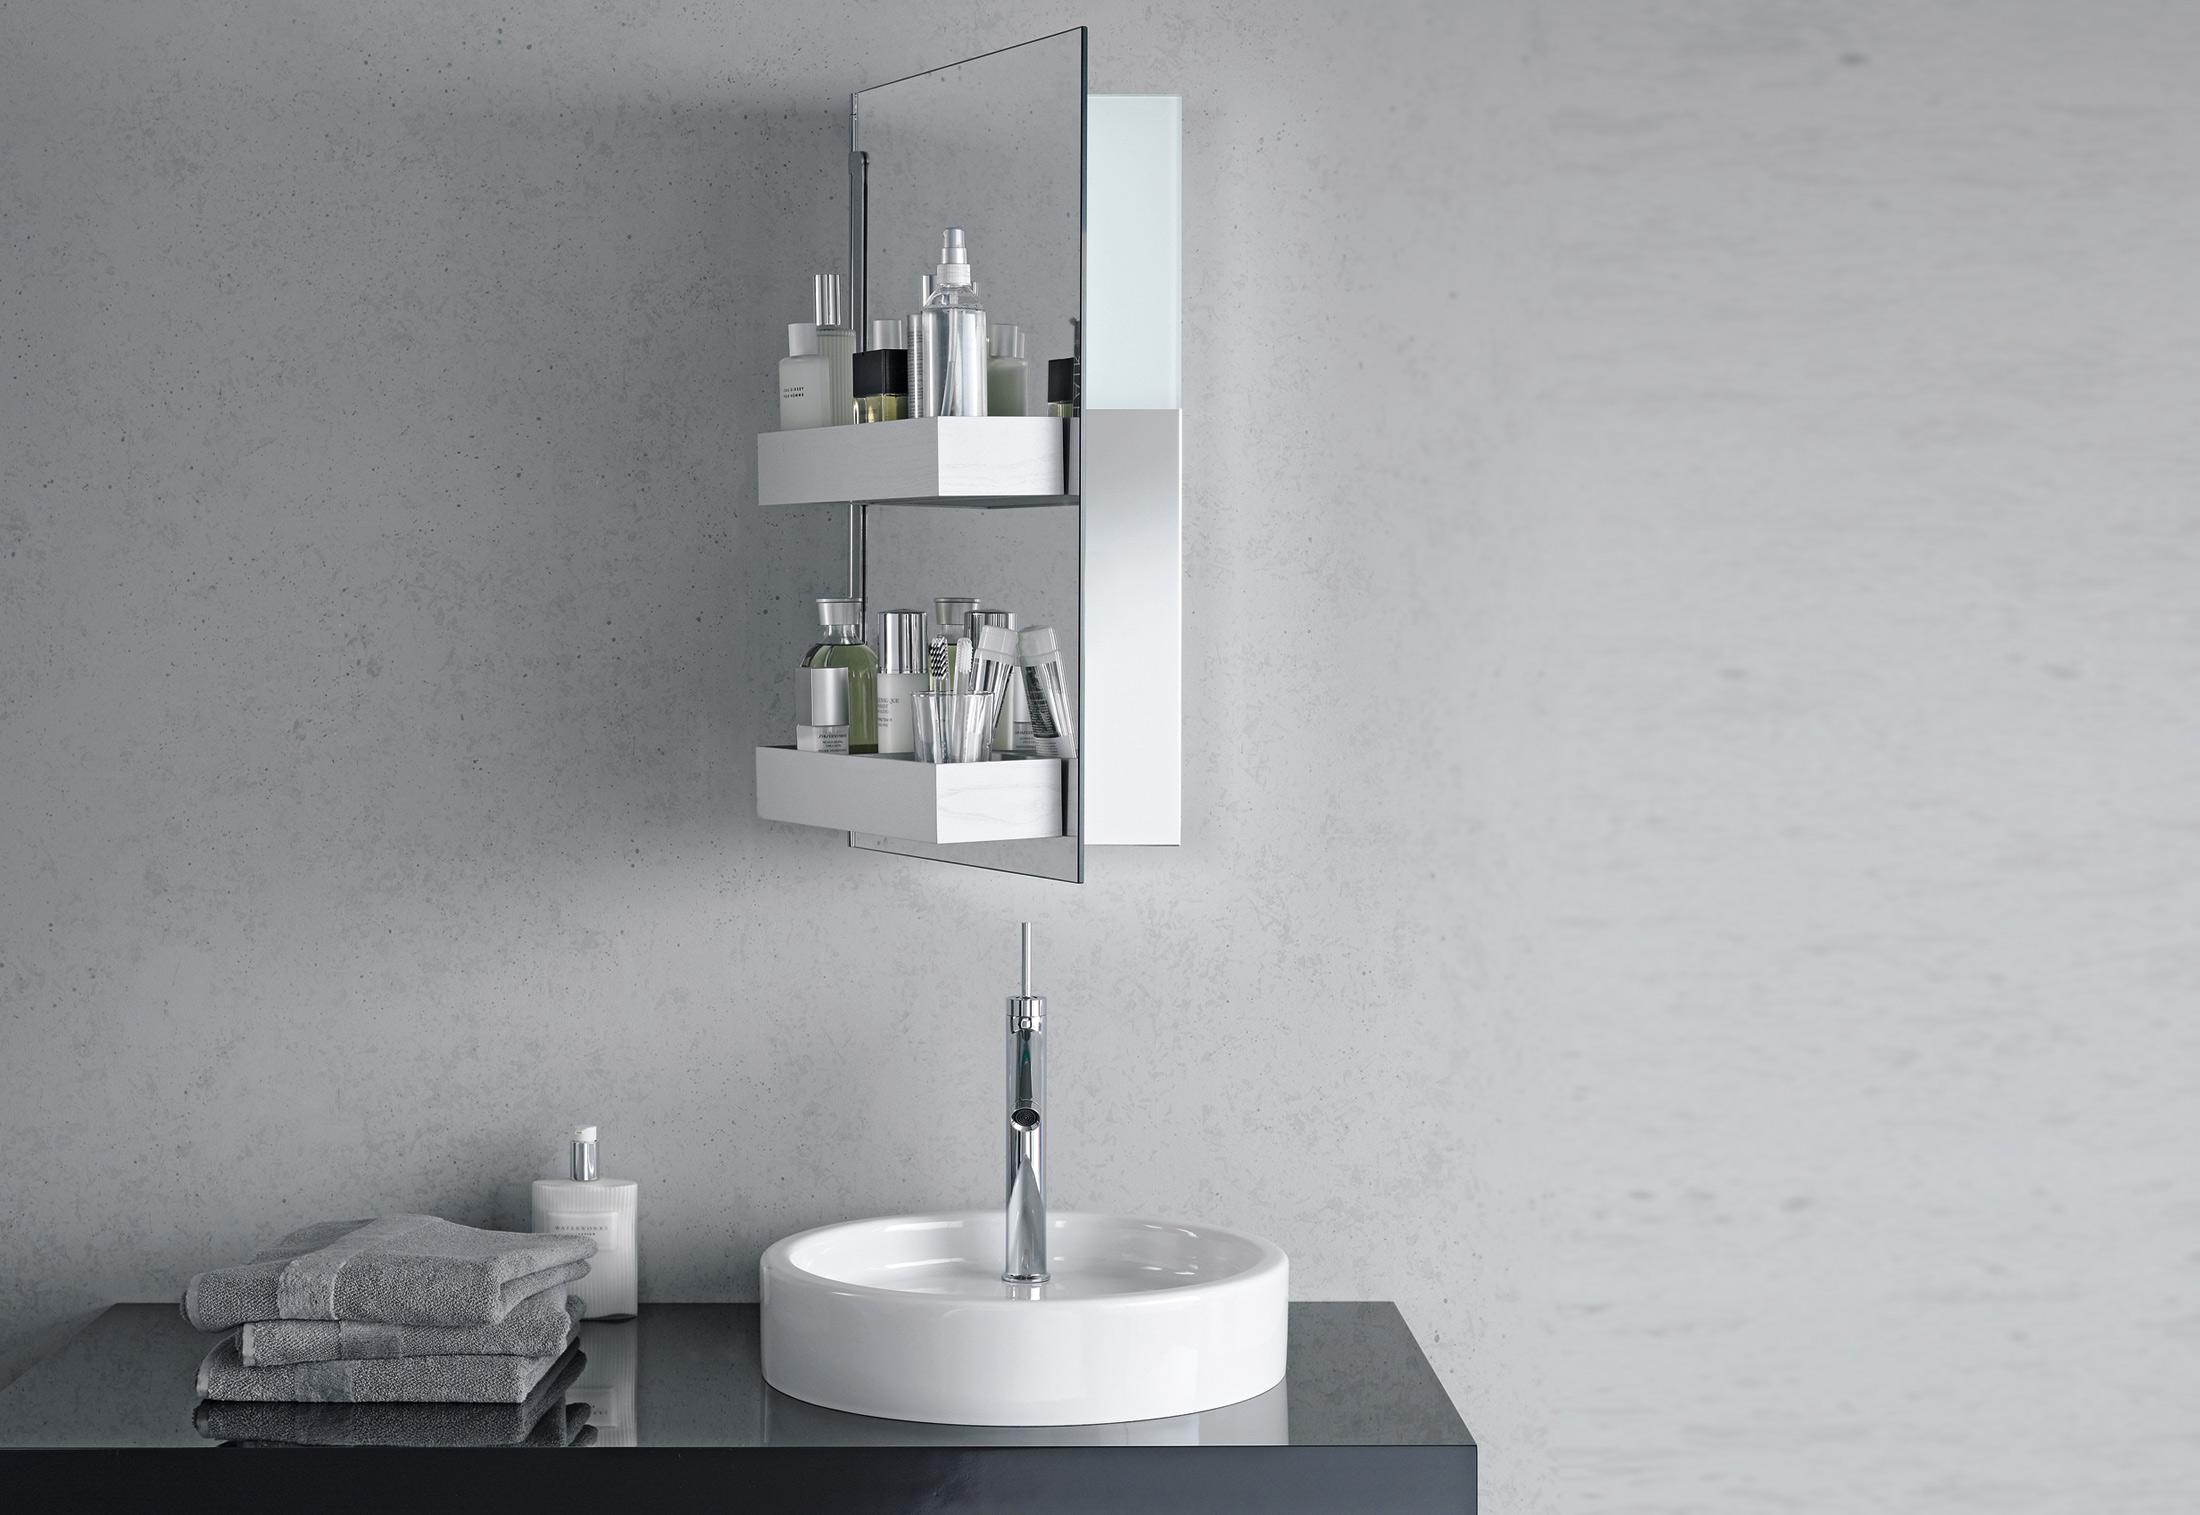 Starck single washing basin round by Duravit | STYLEPARK